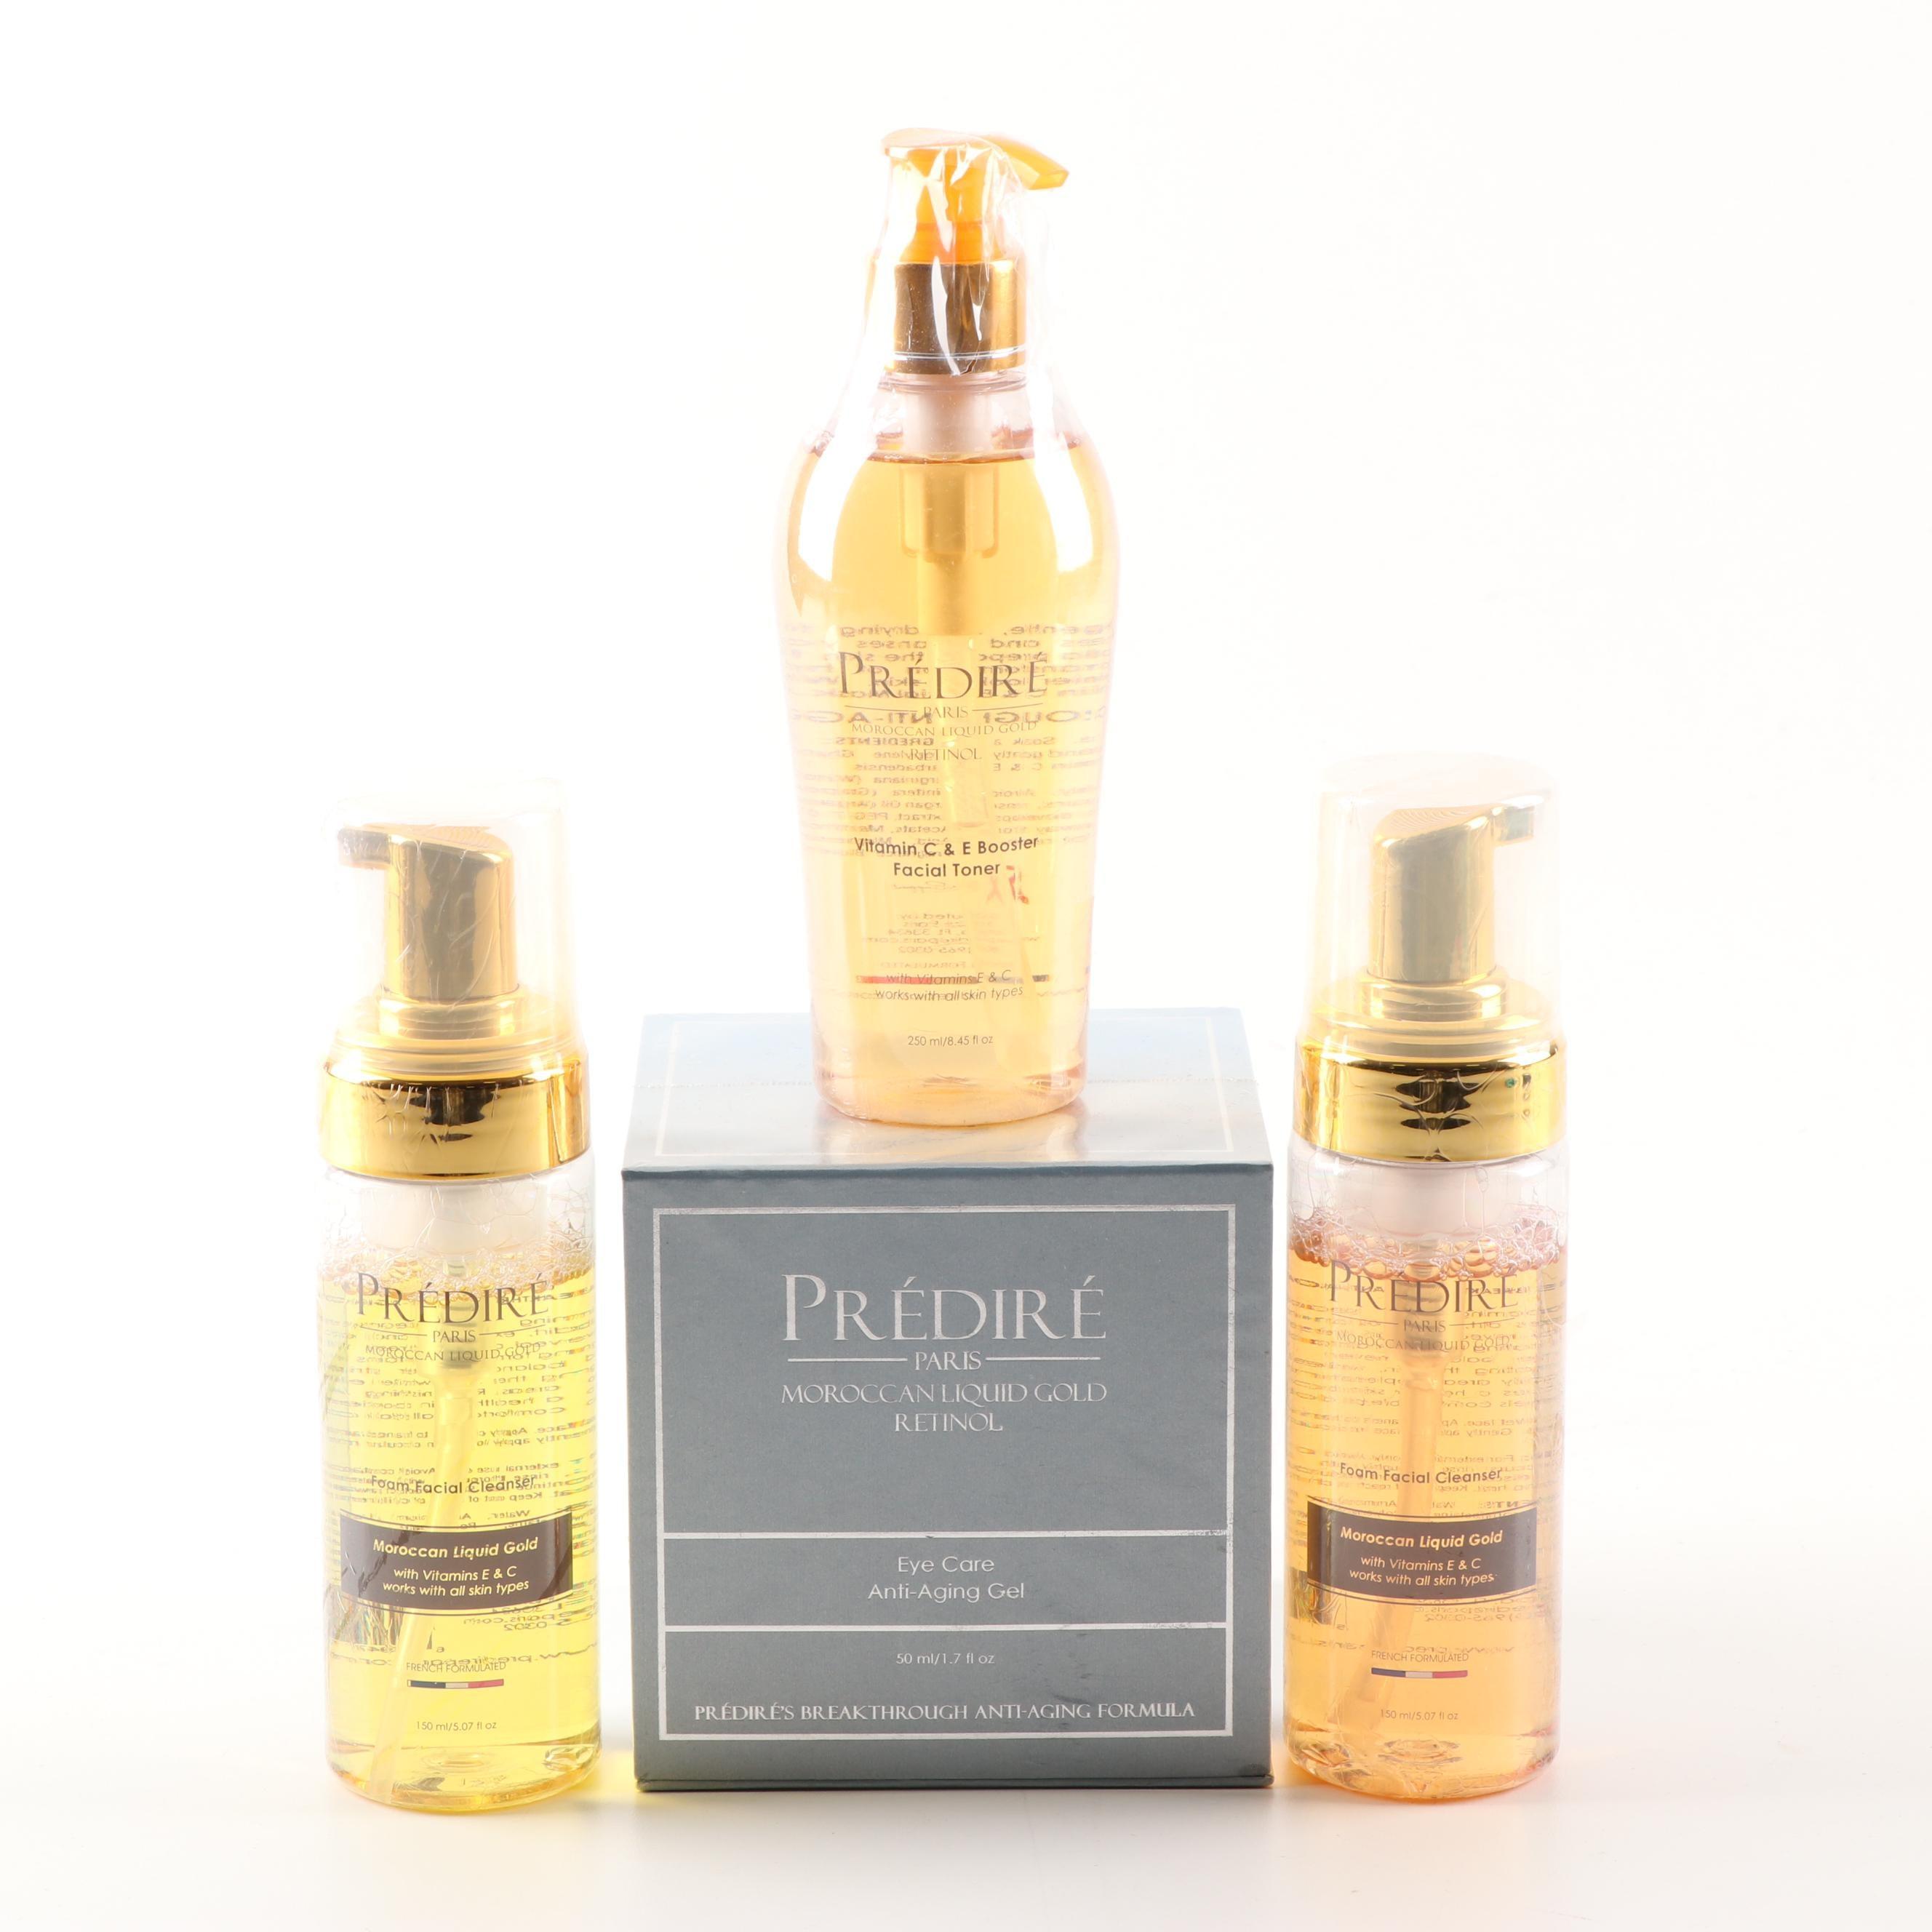 Prédiré Paris Moroccan Liquid Gold Skincare